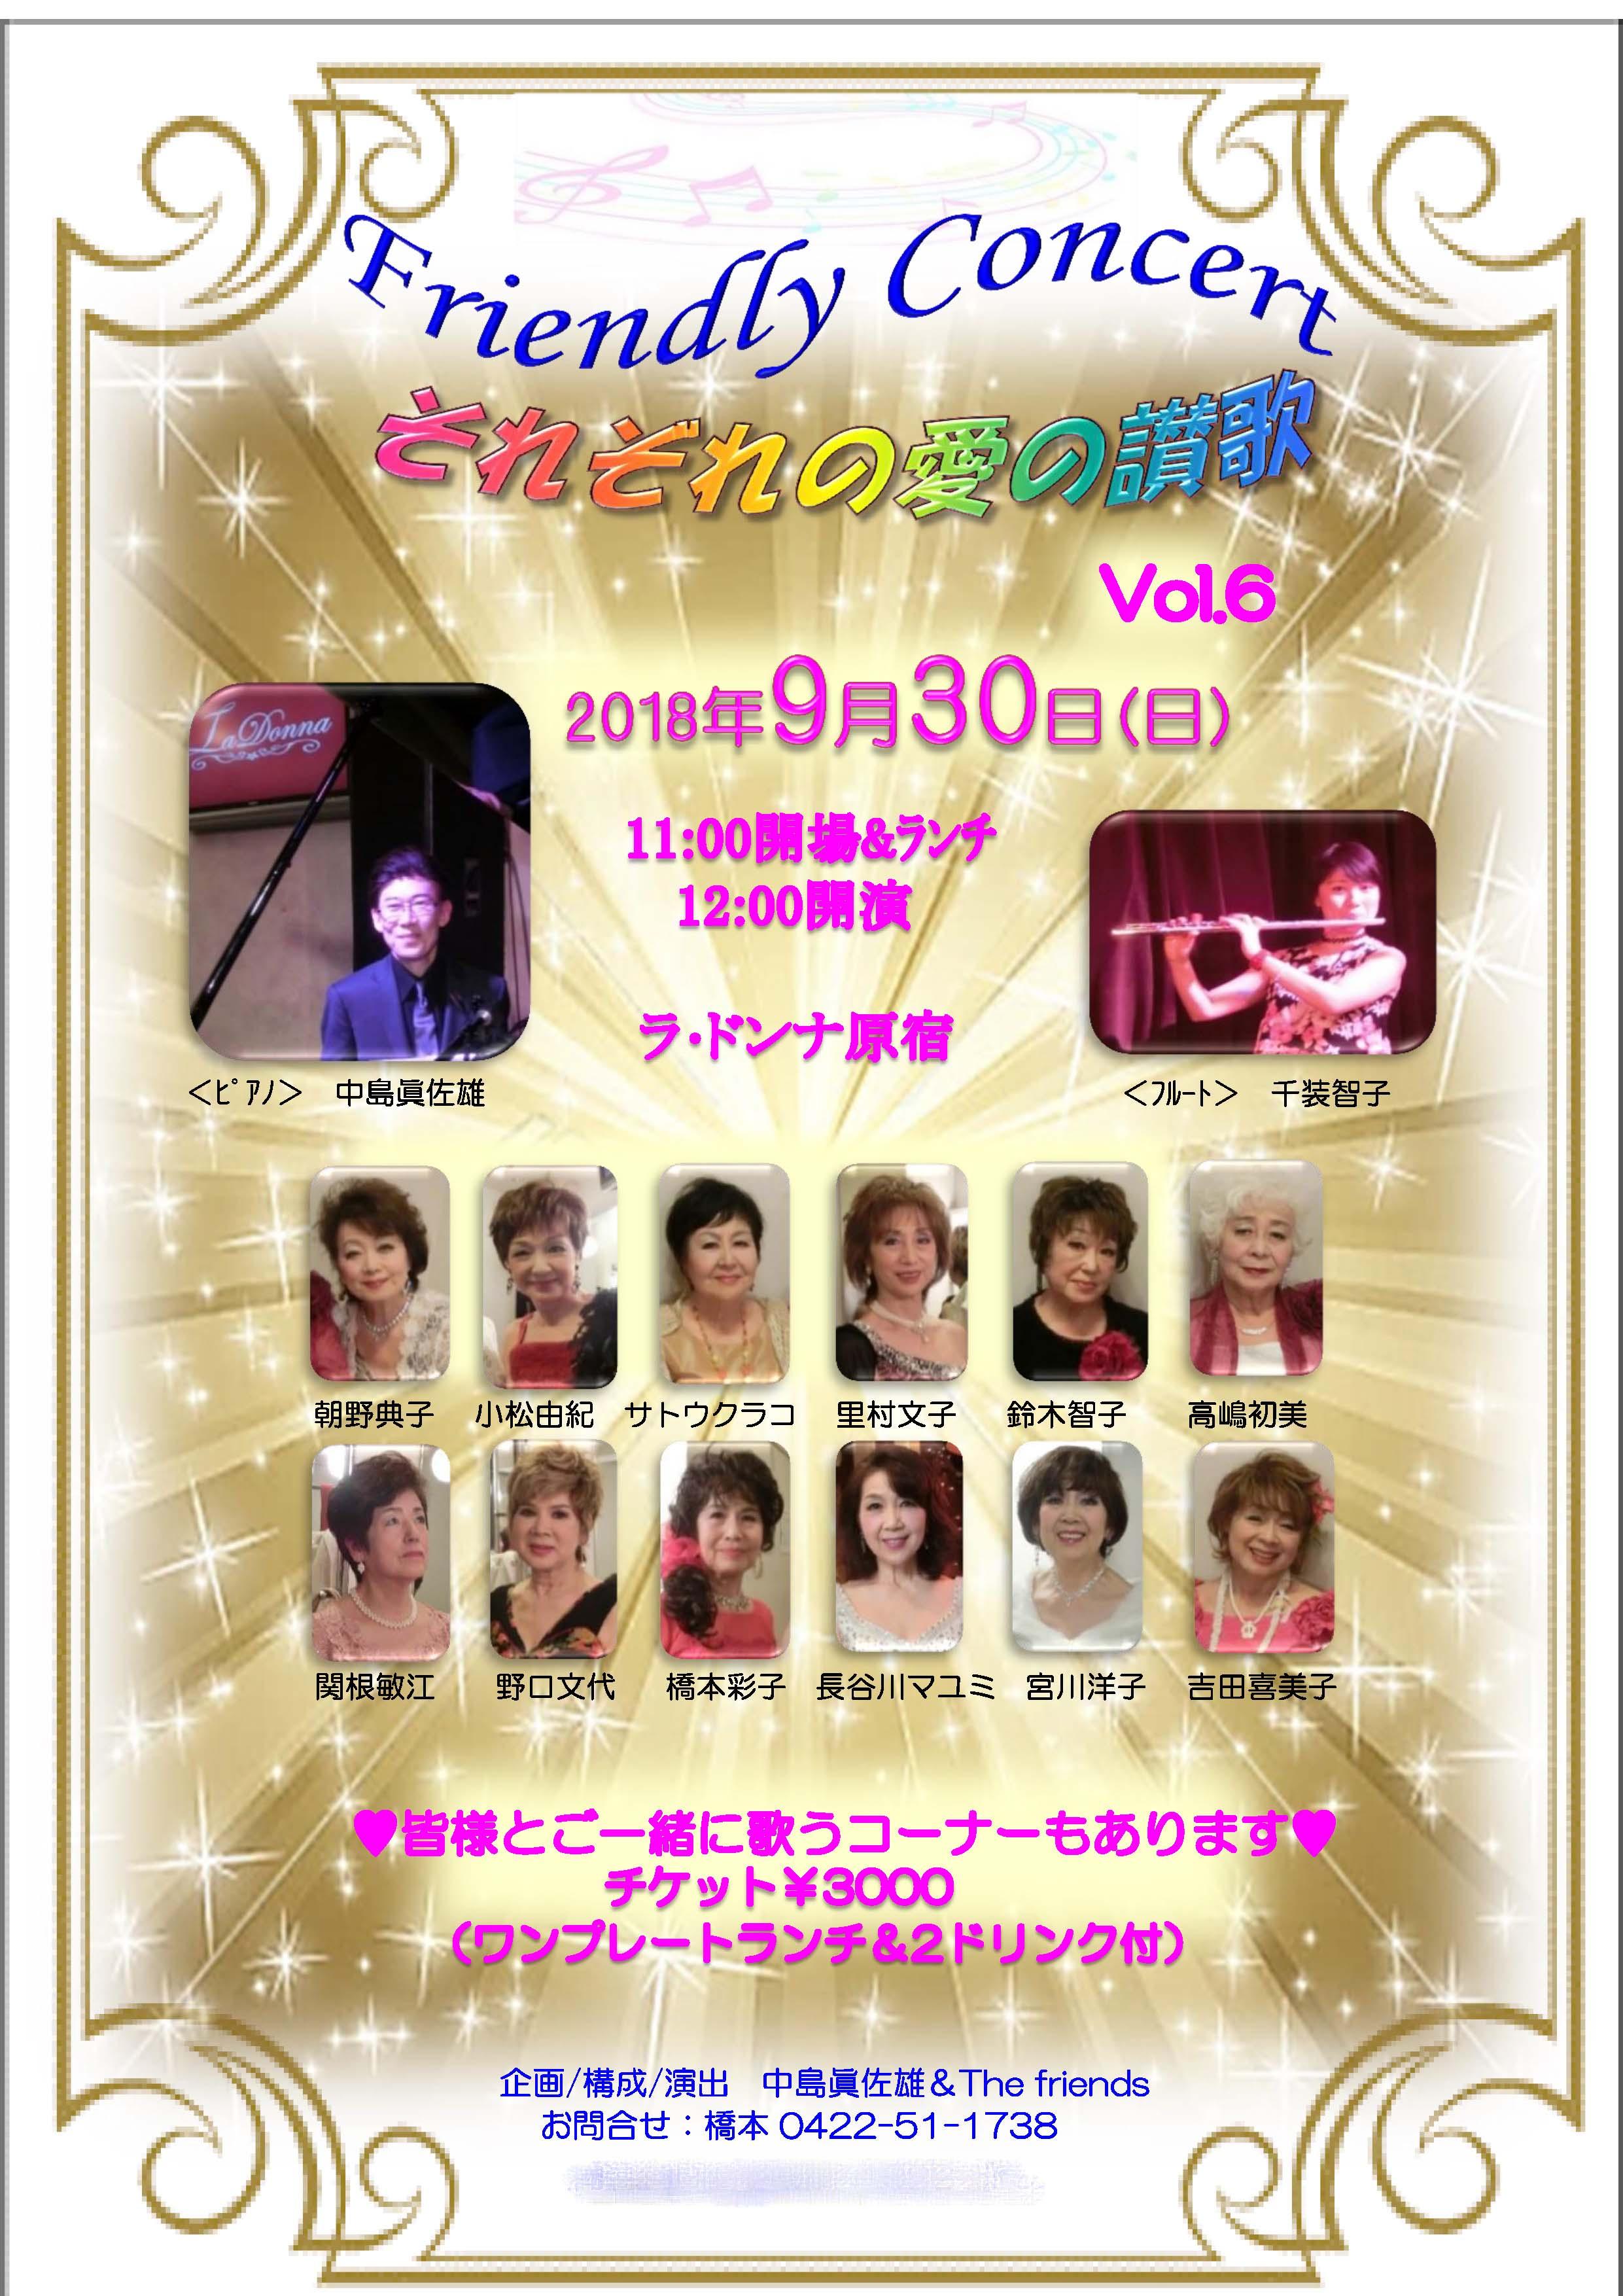 Friendly Concert それぞれの愛の賛歌 Vol.6